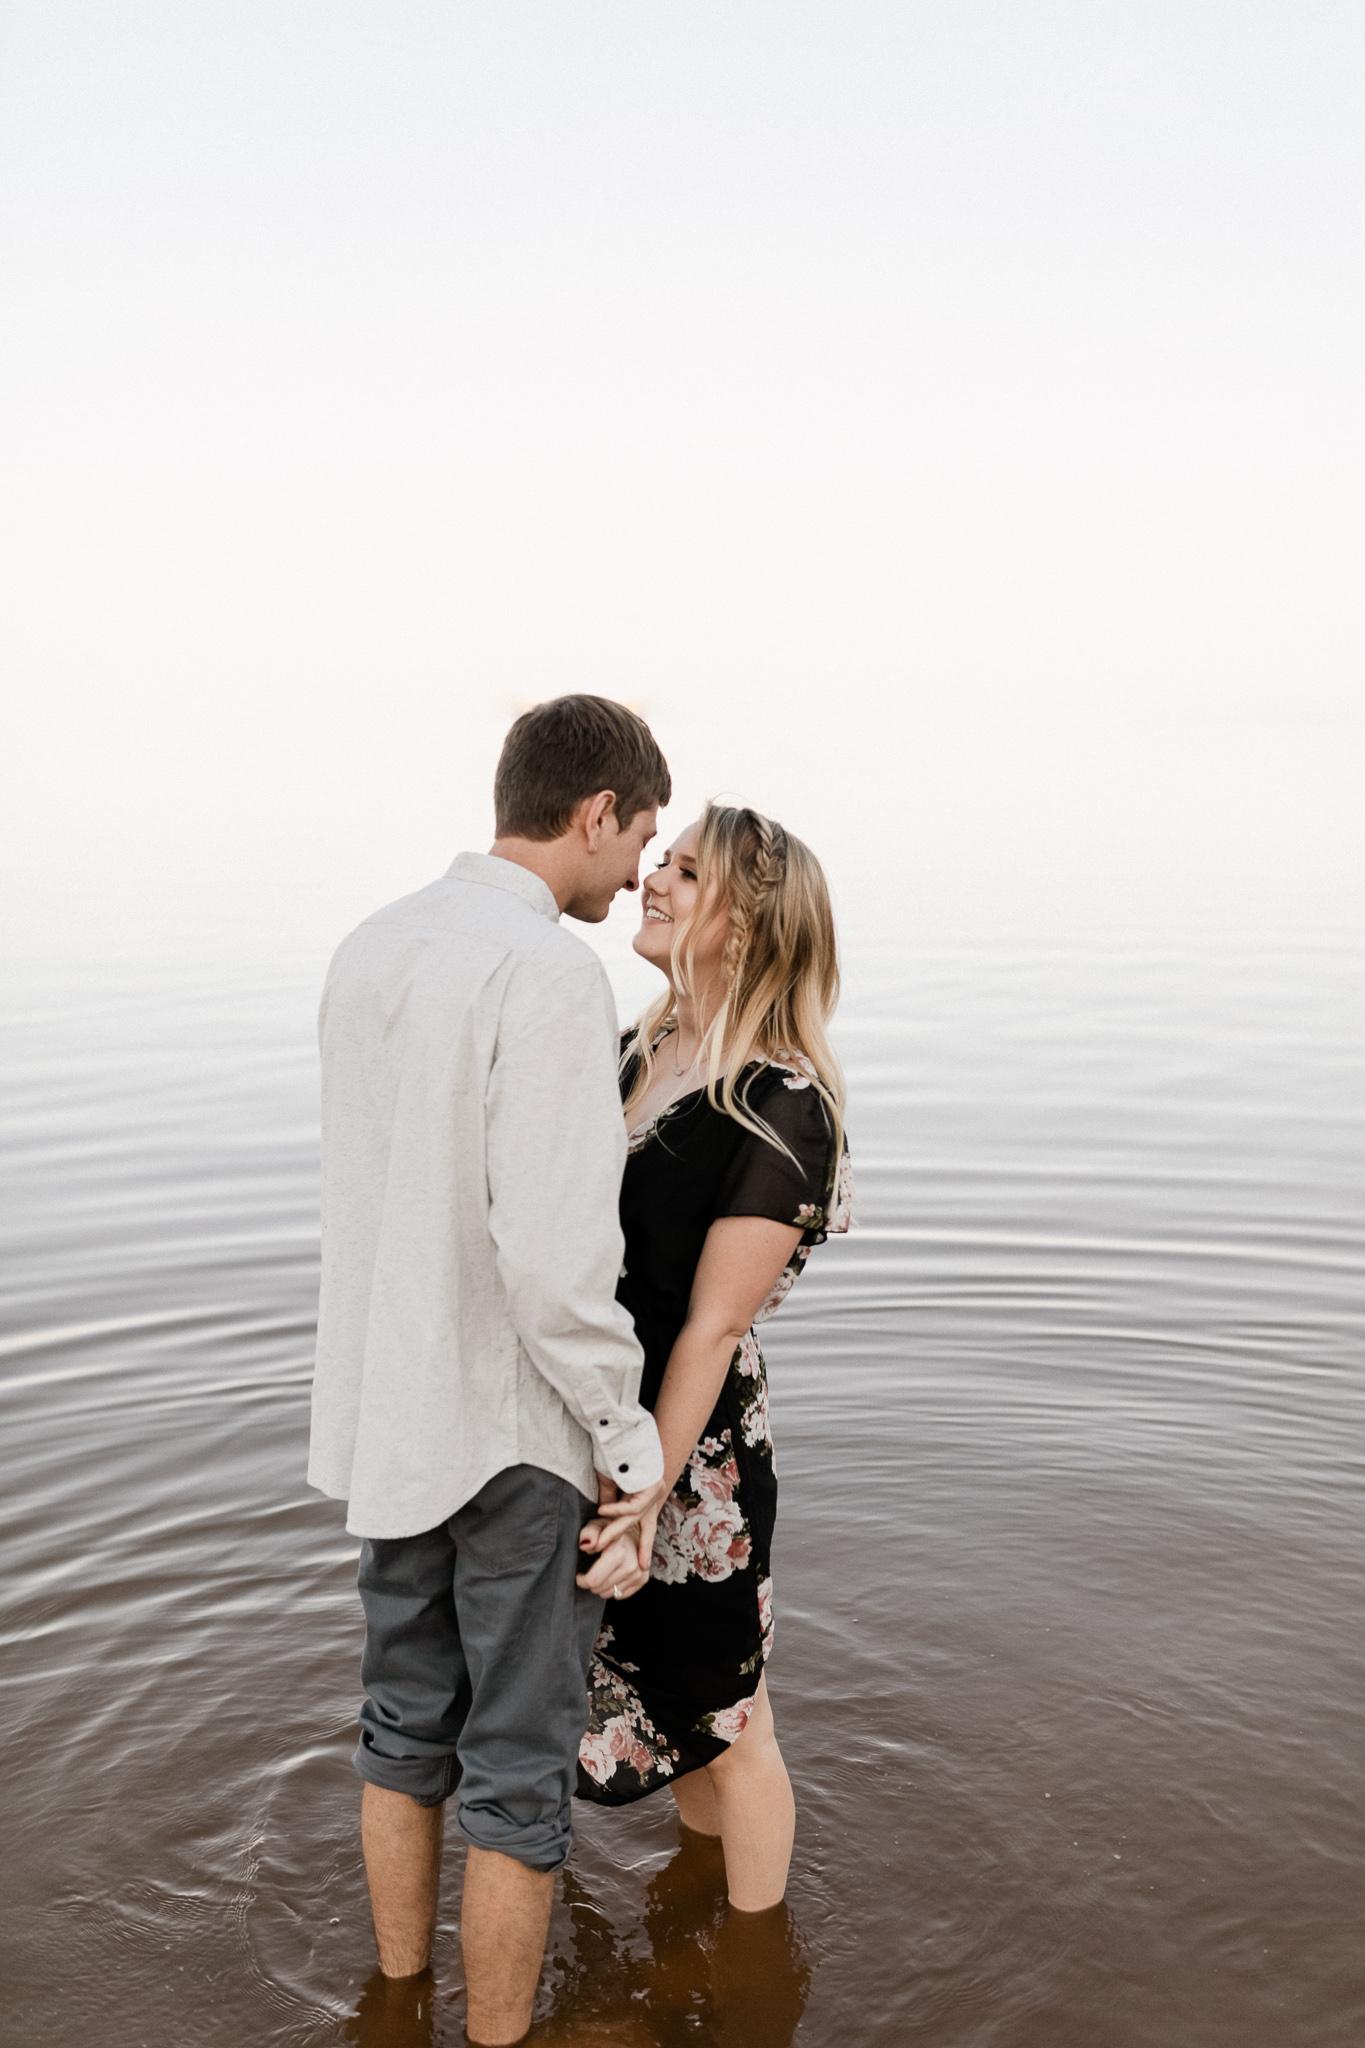 Kyle + Brittany | Fall Lake Engagement Photos | Oklahoma Lifestyle Photographer-17.jpg